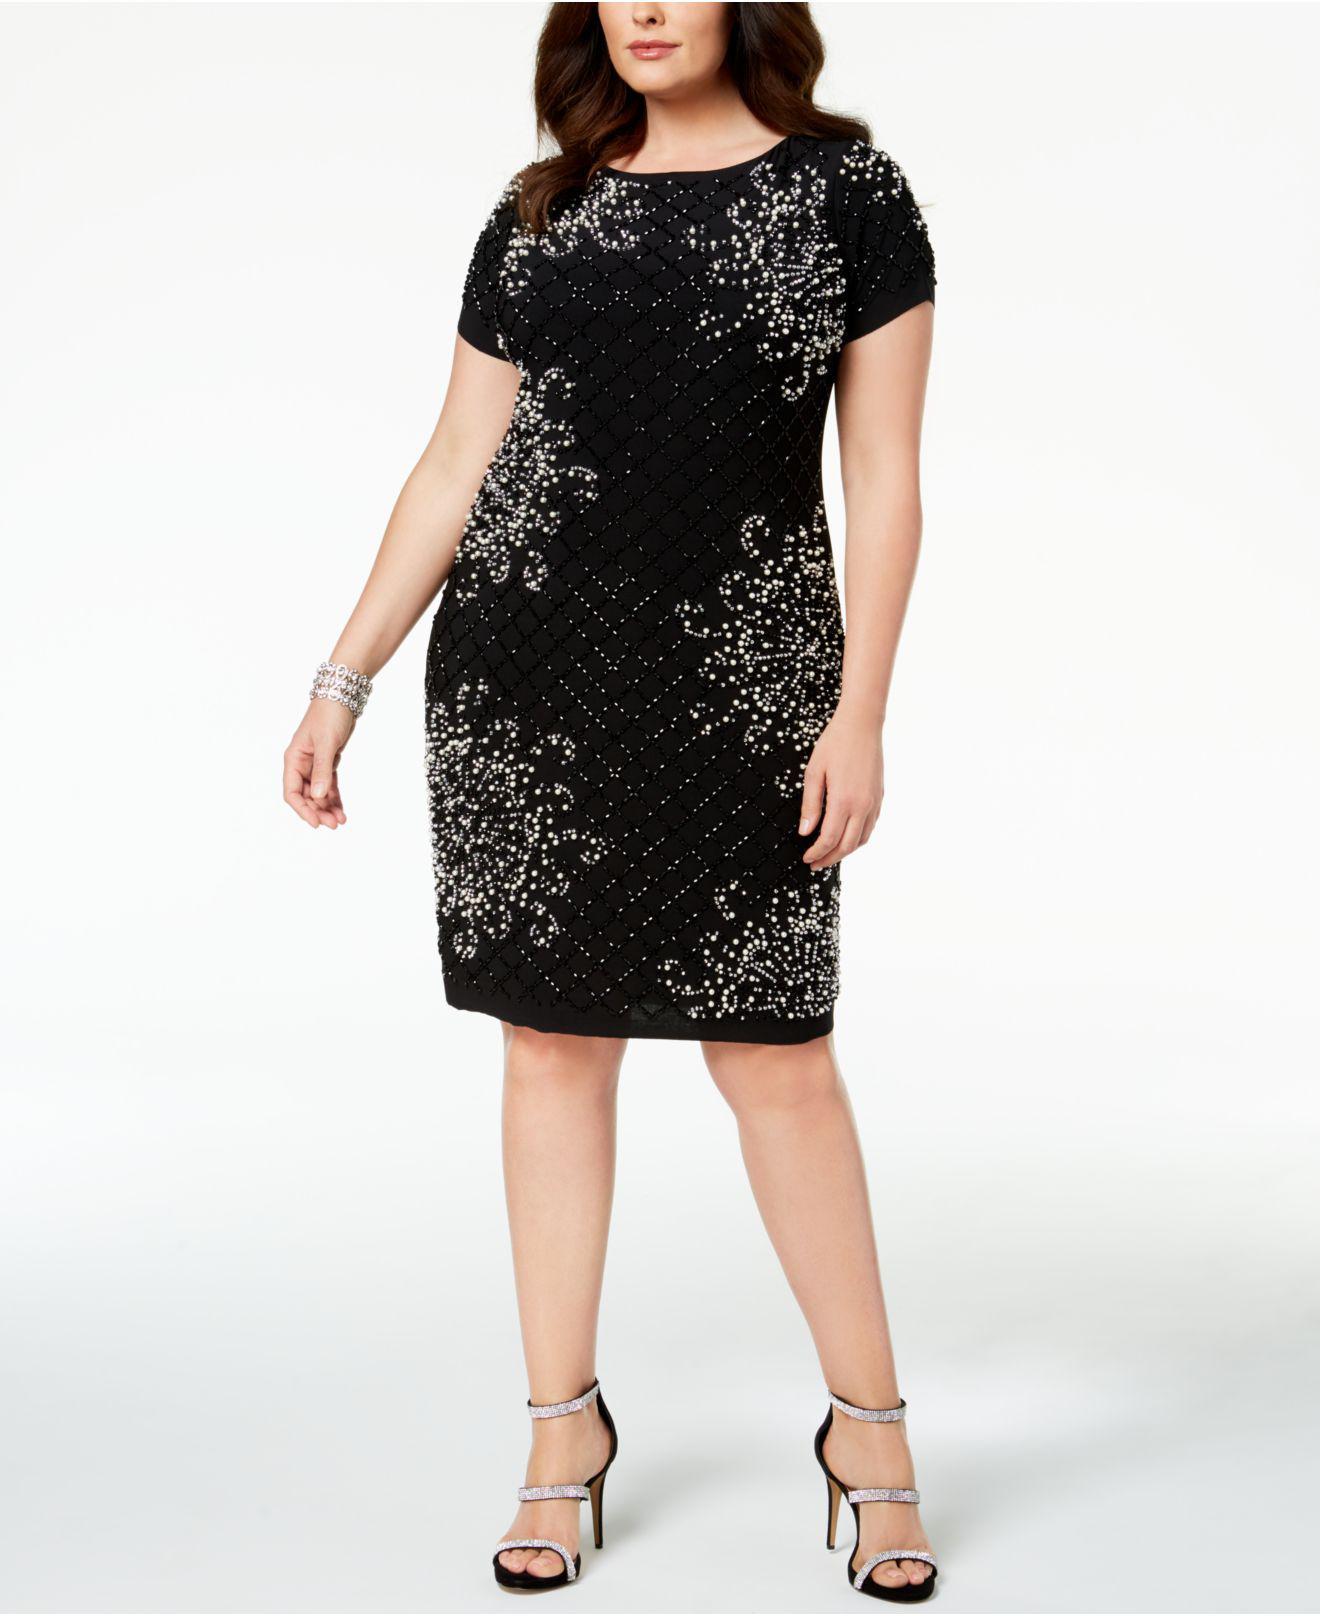 6781159ea2f Lyst - Betsy   Adam Plus Size Embellished Sheath Dress in Black